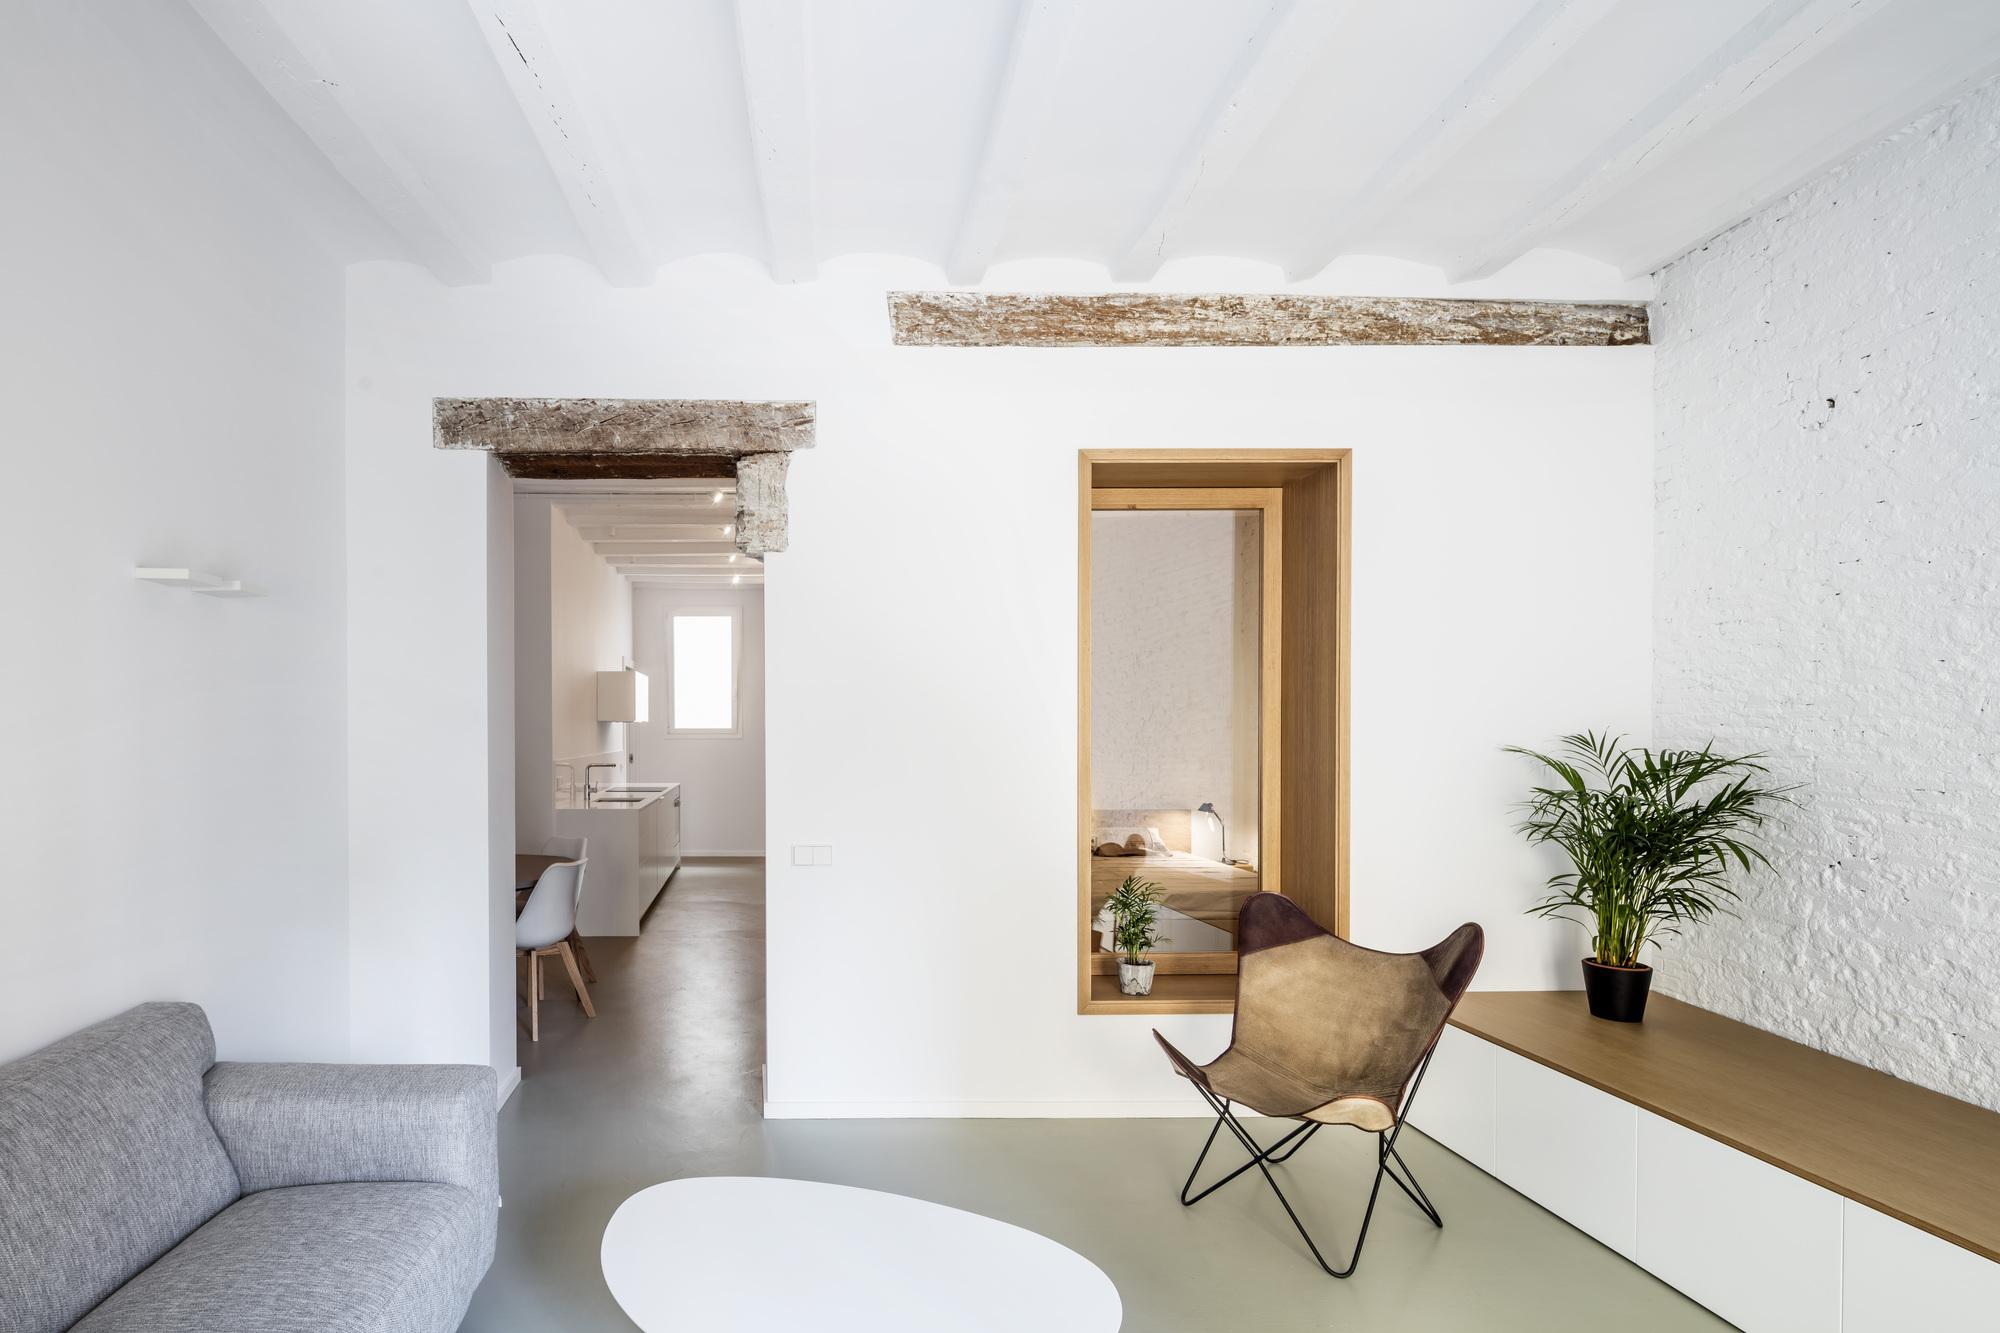 Ts01 Interior Refurbishment Alventosa Morell Arquitectes